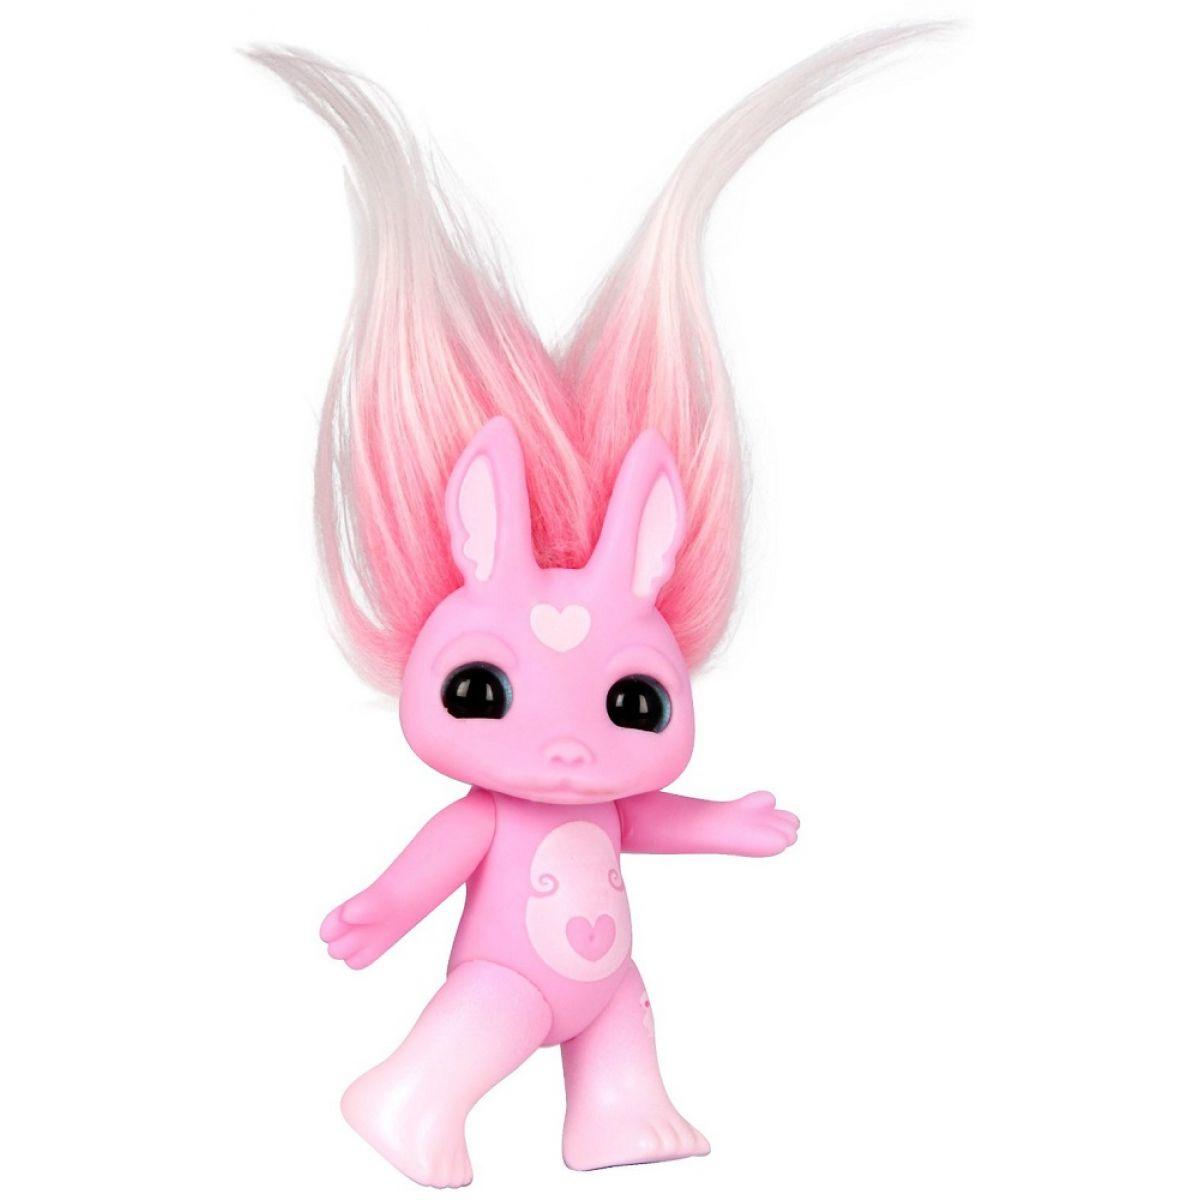 Zelfs IV. blistr - Sugar Bunny